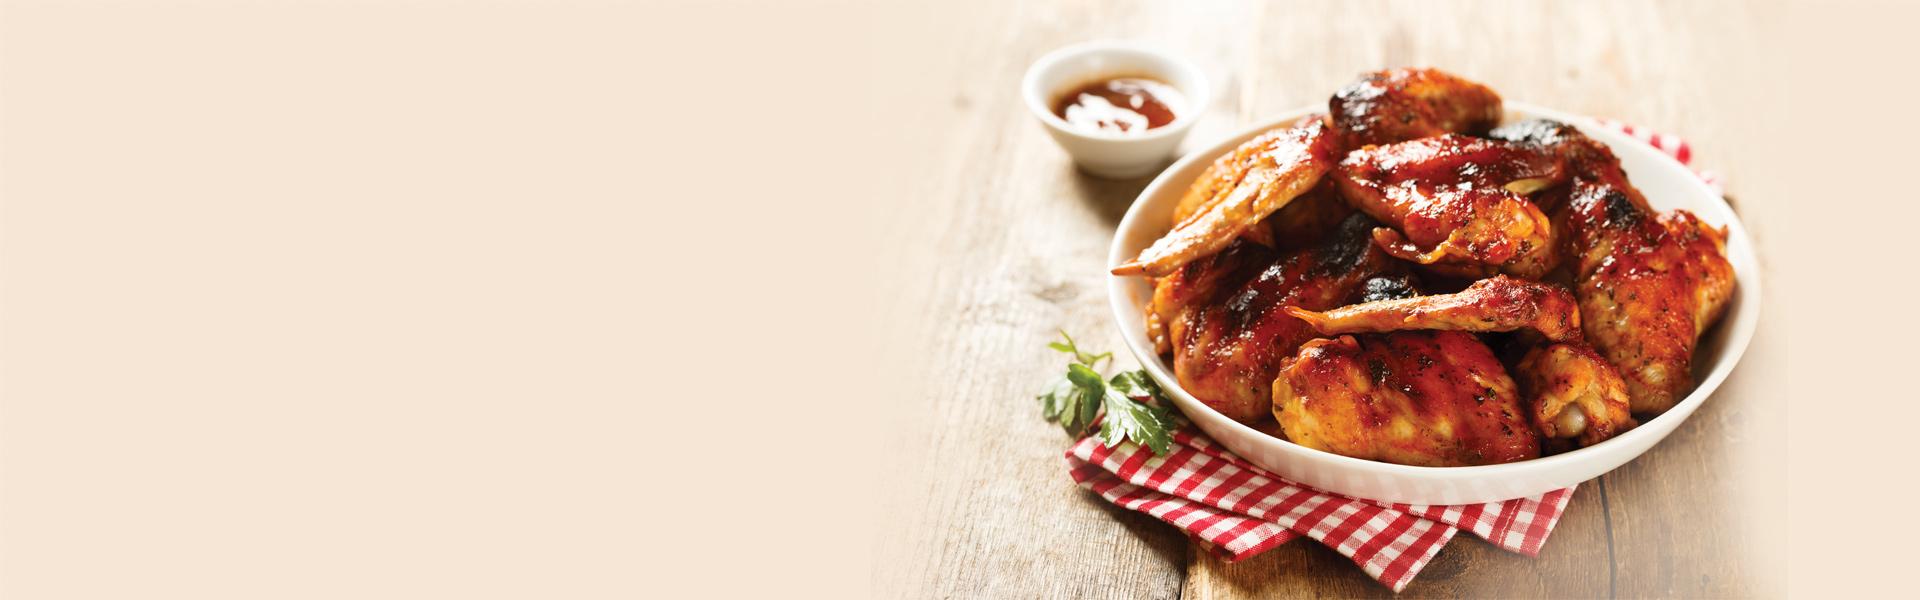 4 Backyard Barbecue Recipes